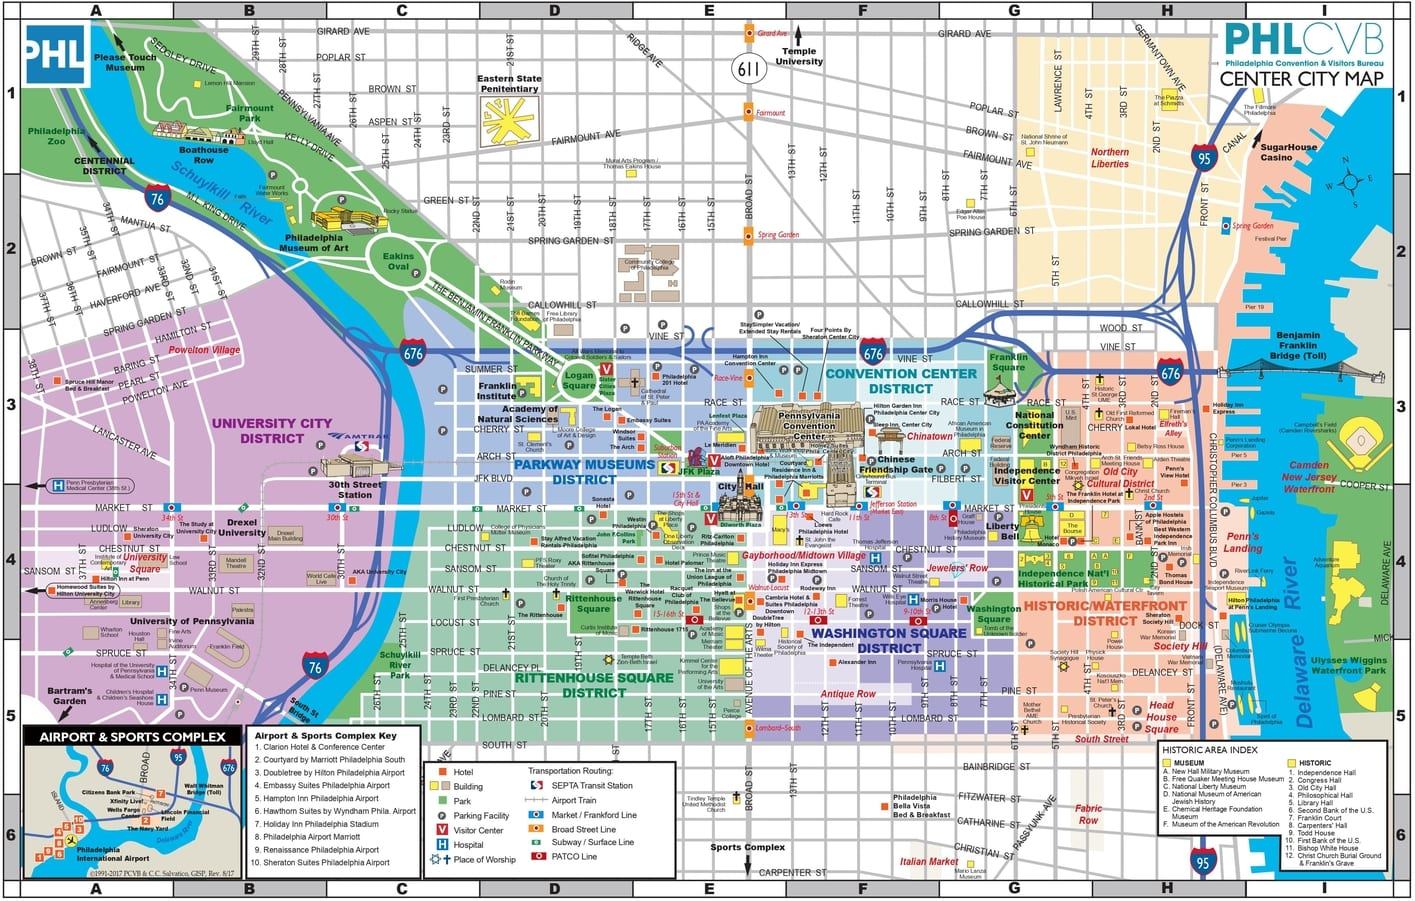 The Philadelphia high-resolution map